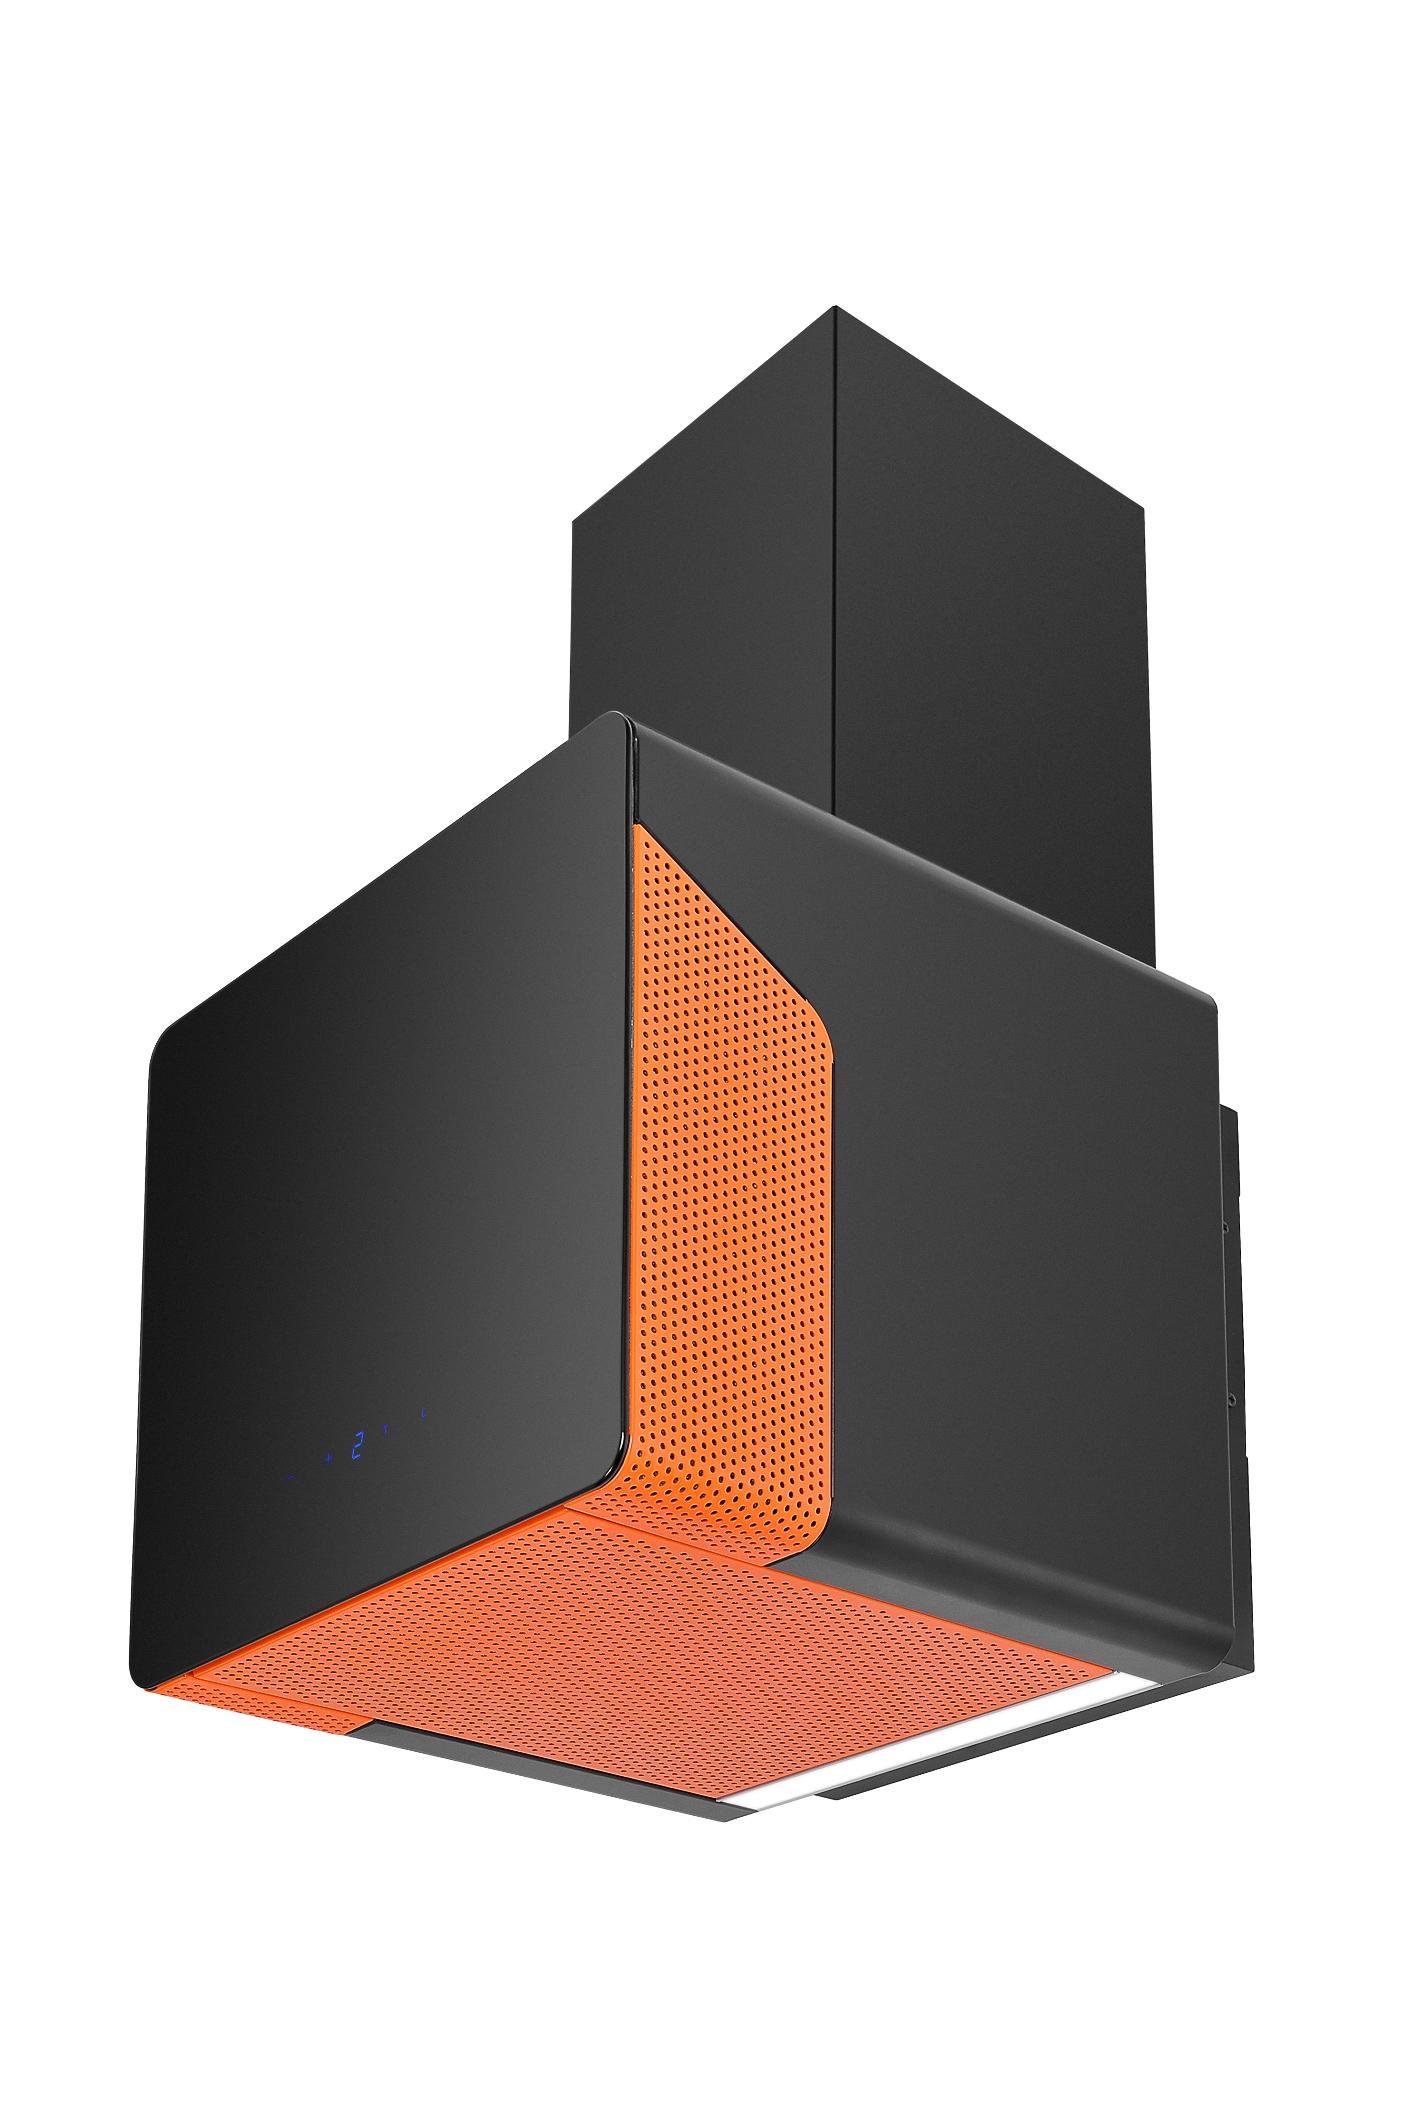 Nowość! Magiczna kostka – okap Cube Neon Ciarko Design